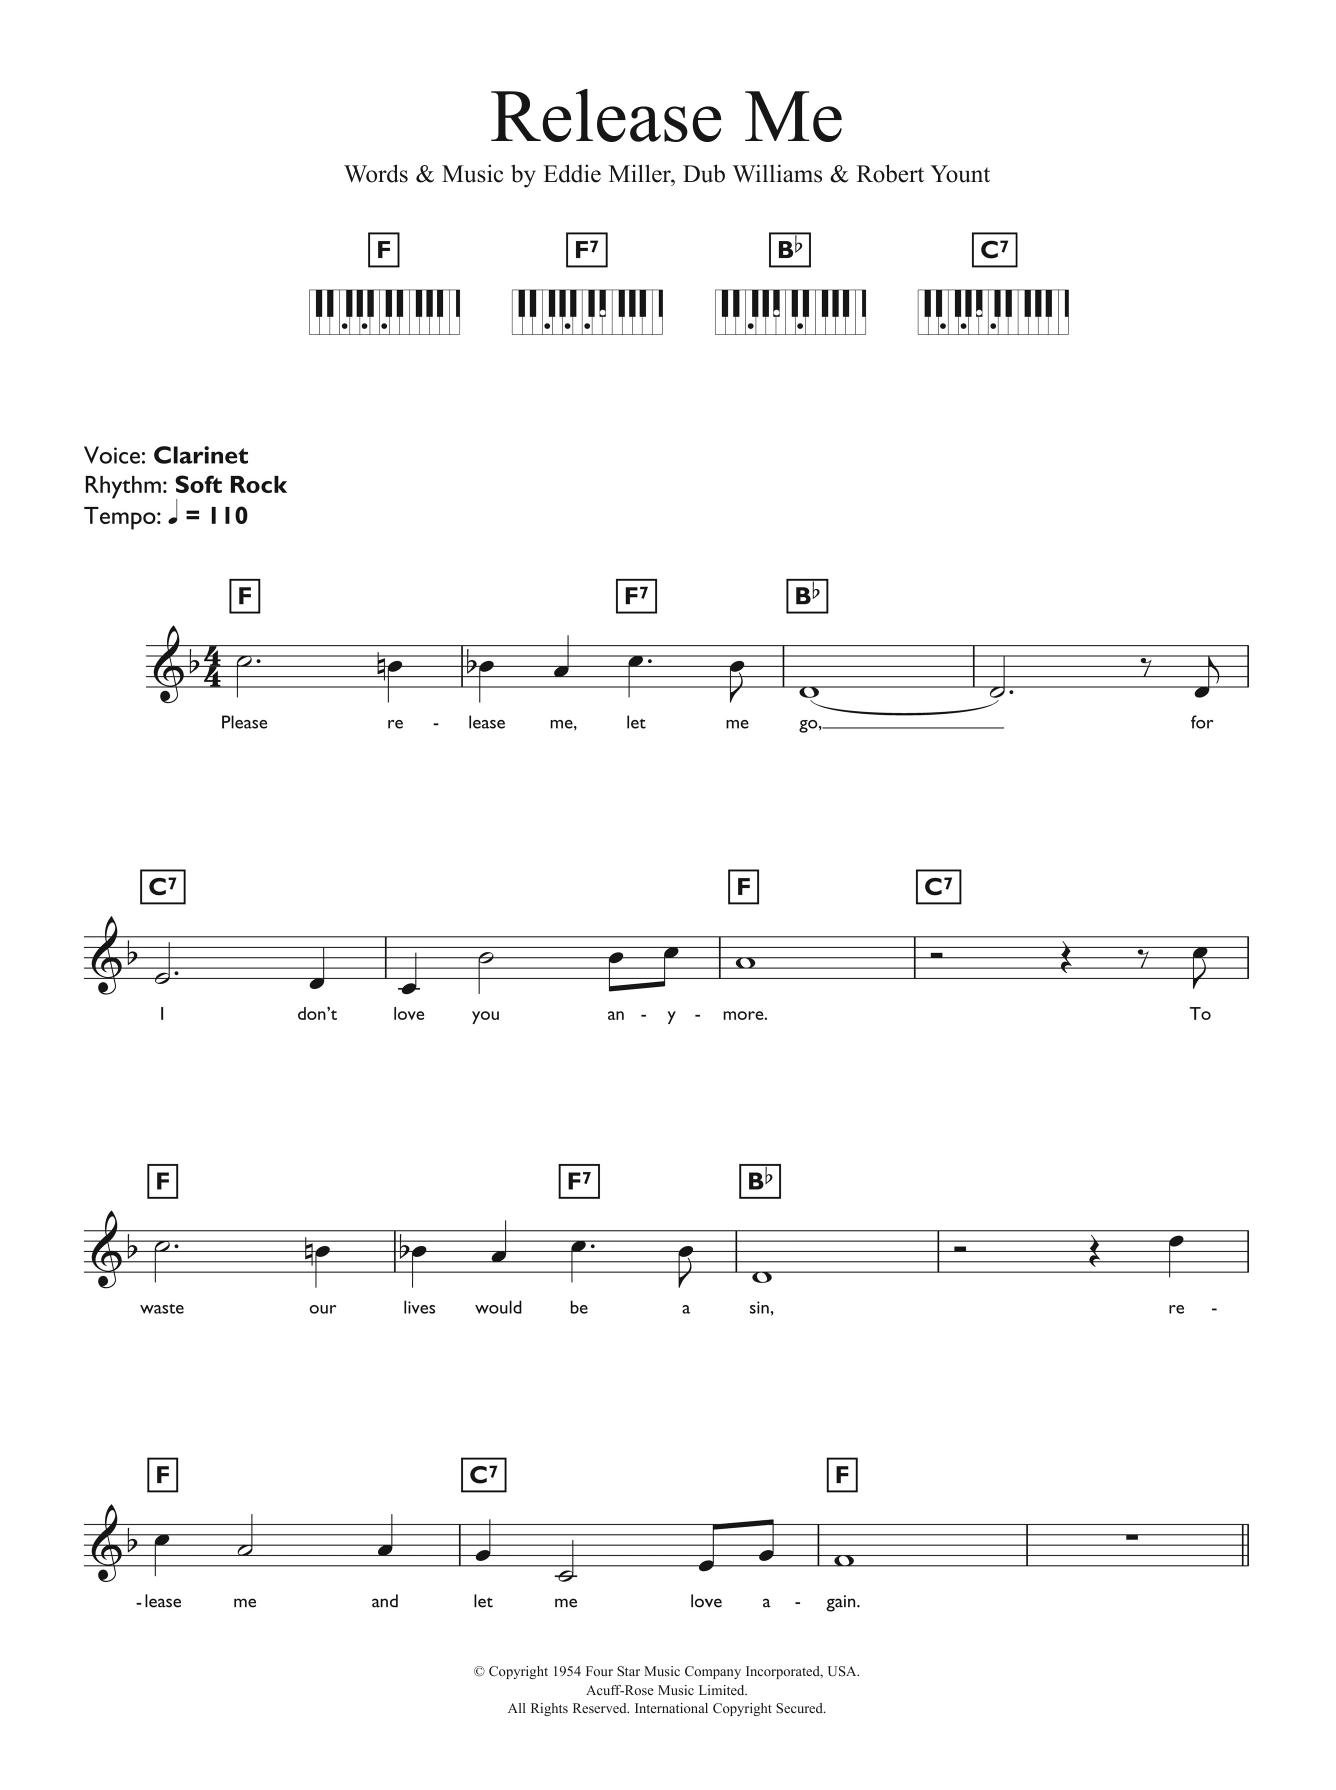 Release Me Sheet Music